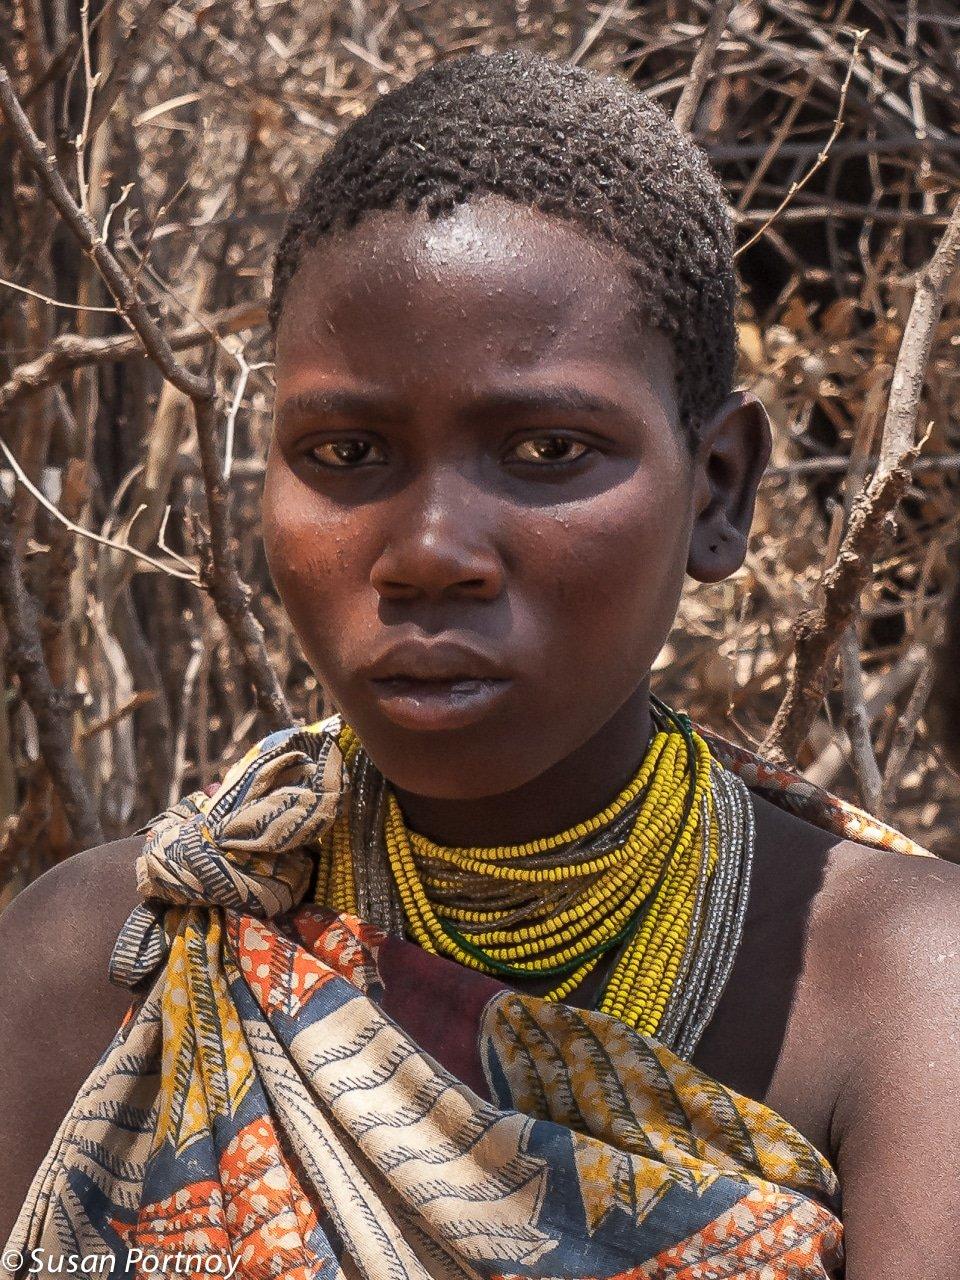 Older Hadzabe girl in Tanzania